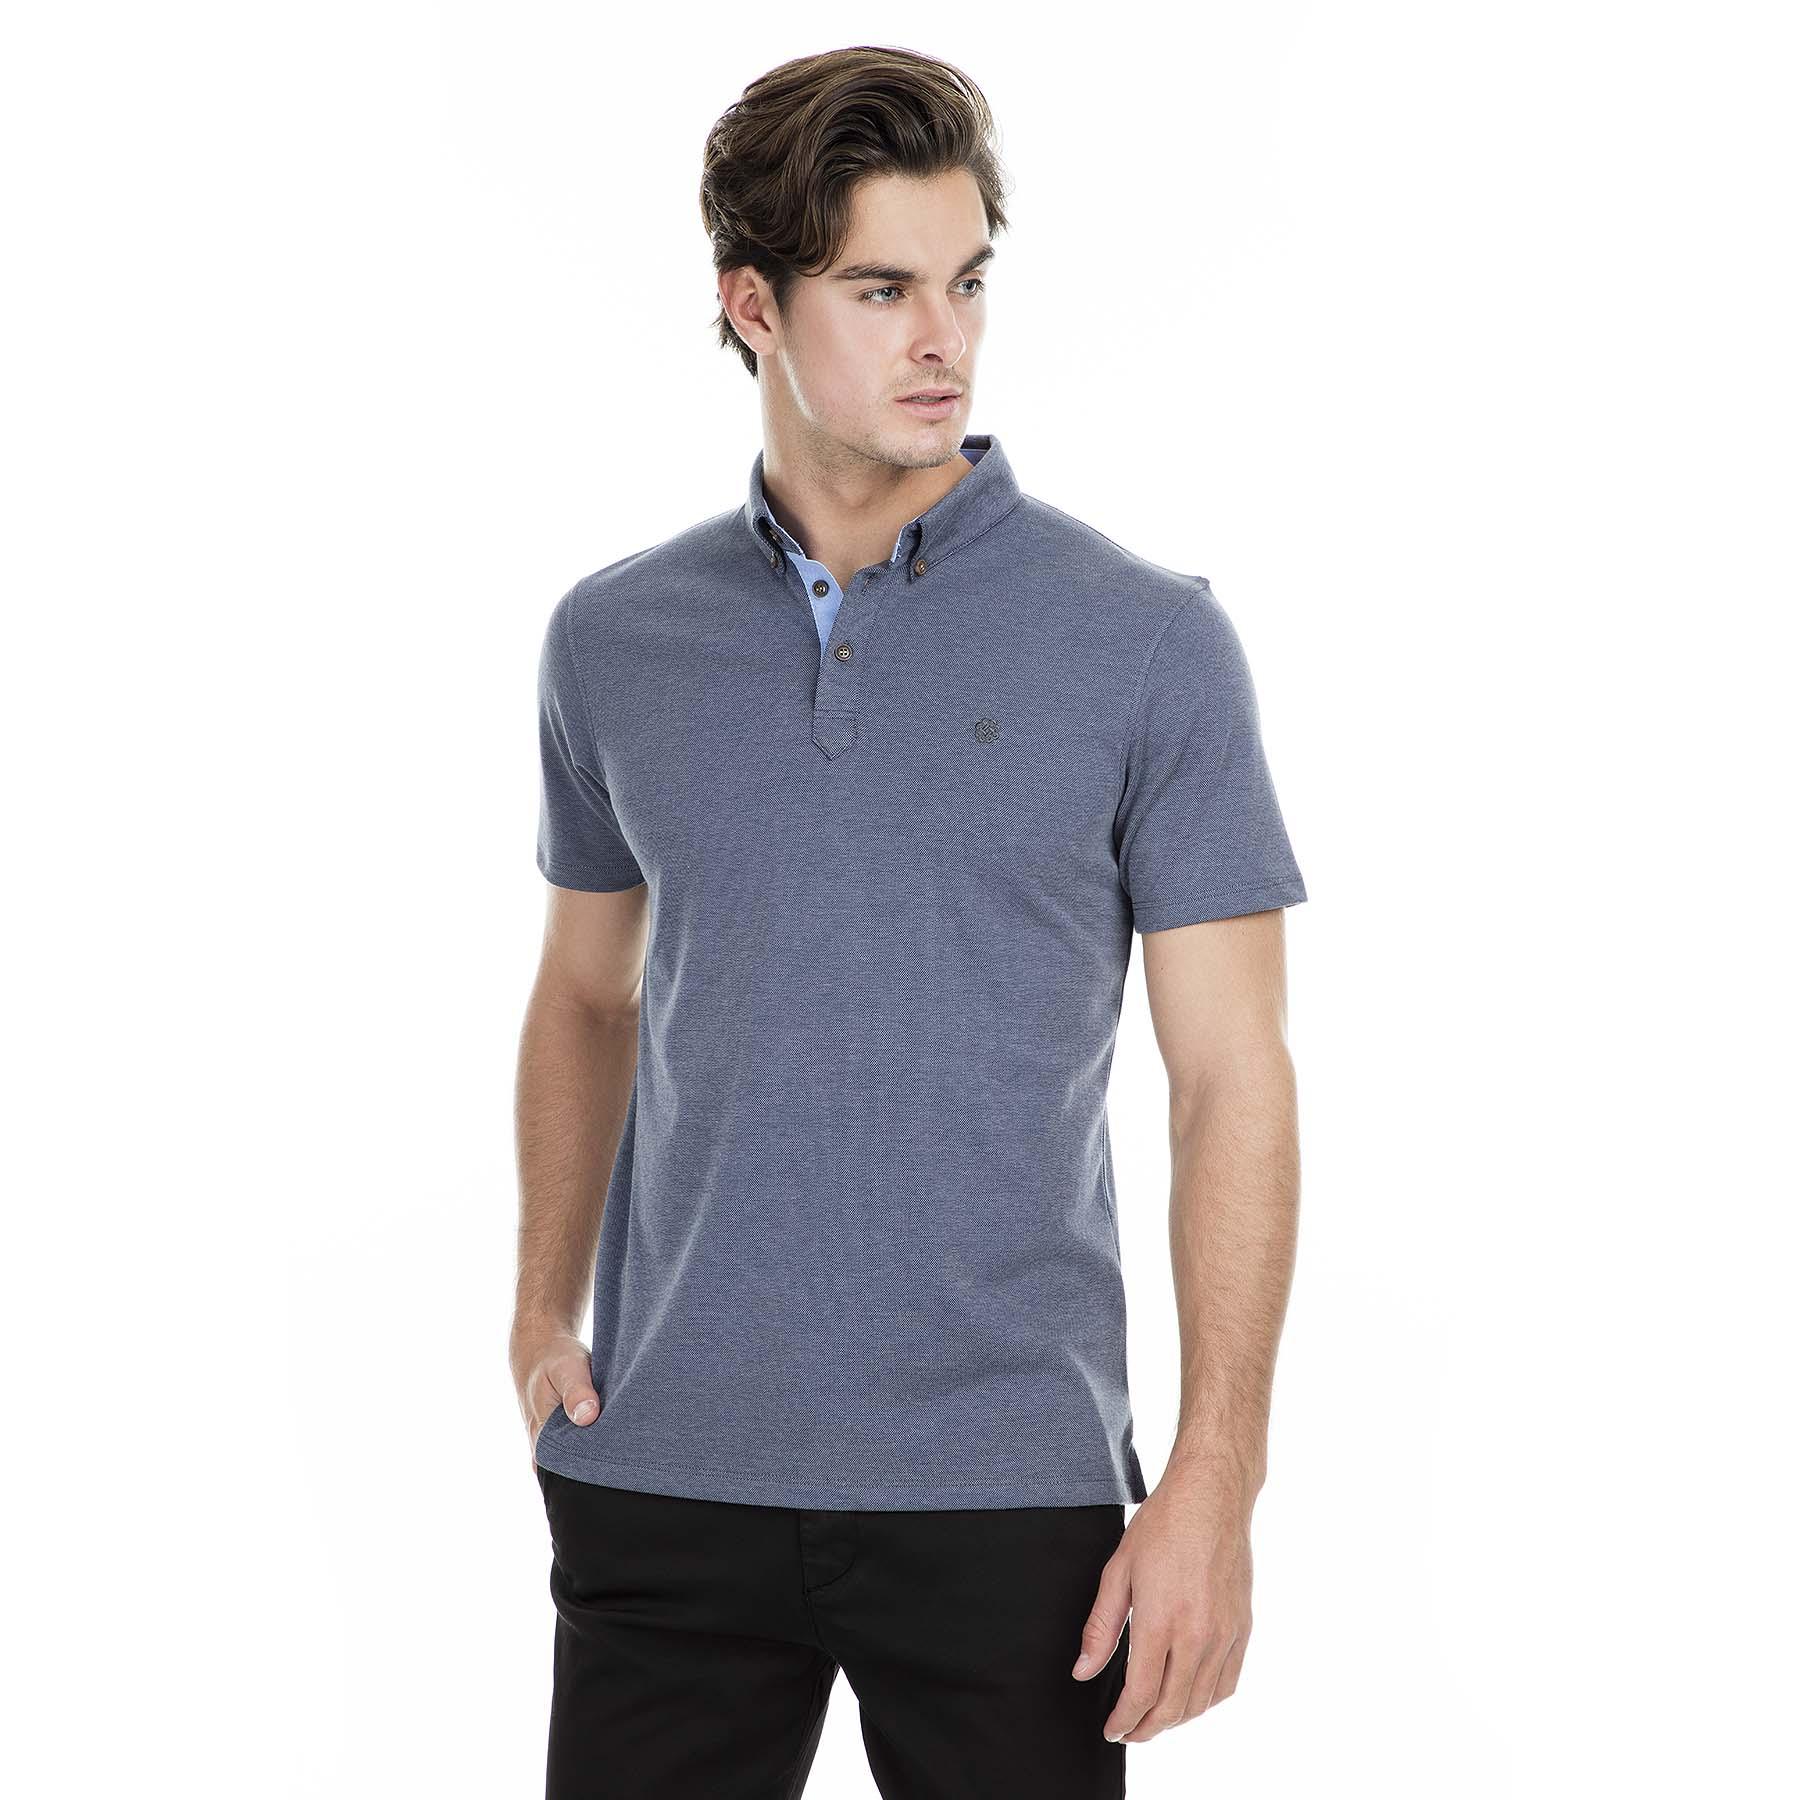 Buratti polo t camisas masculinas shİrt 43619063